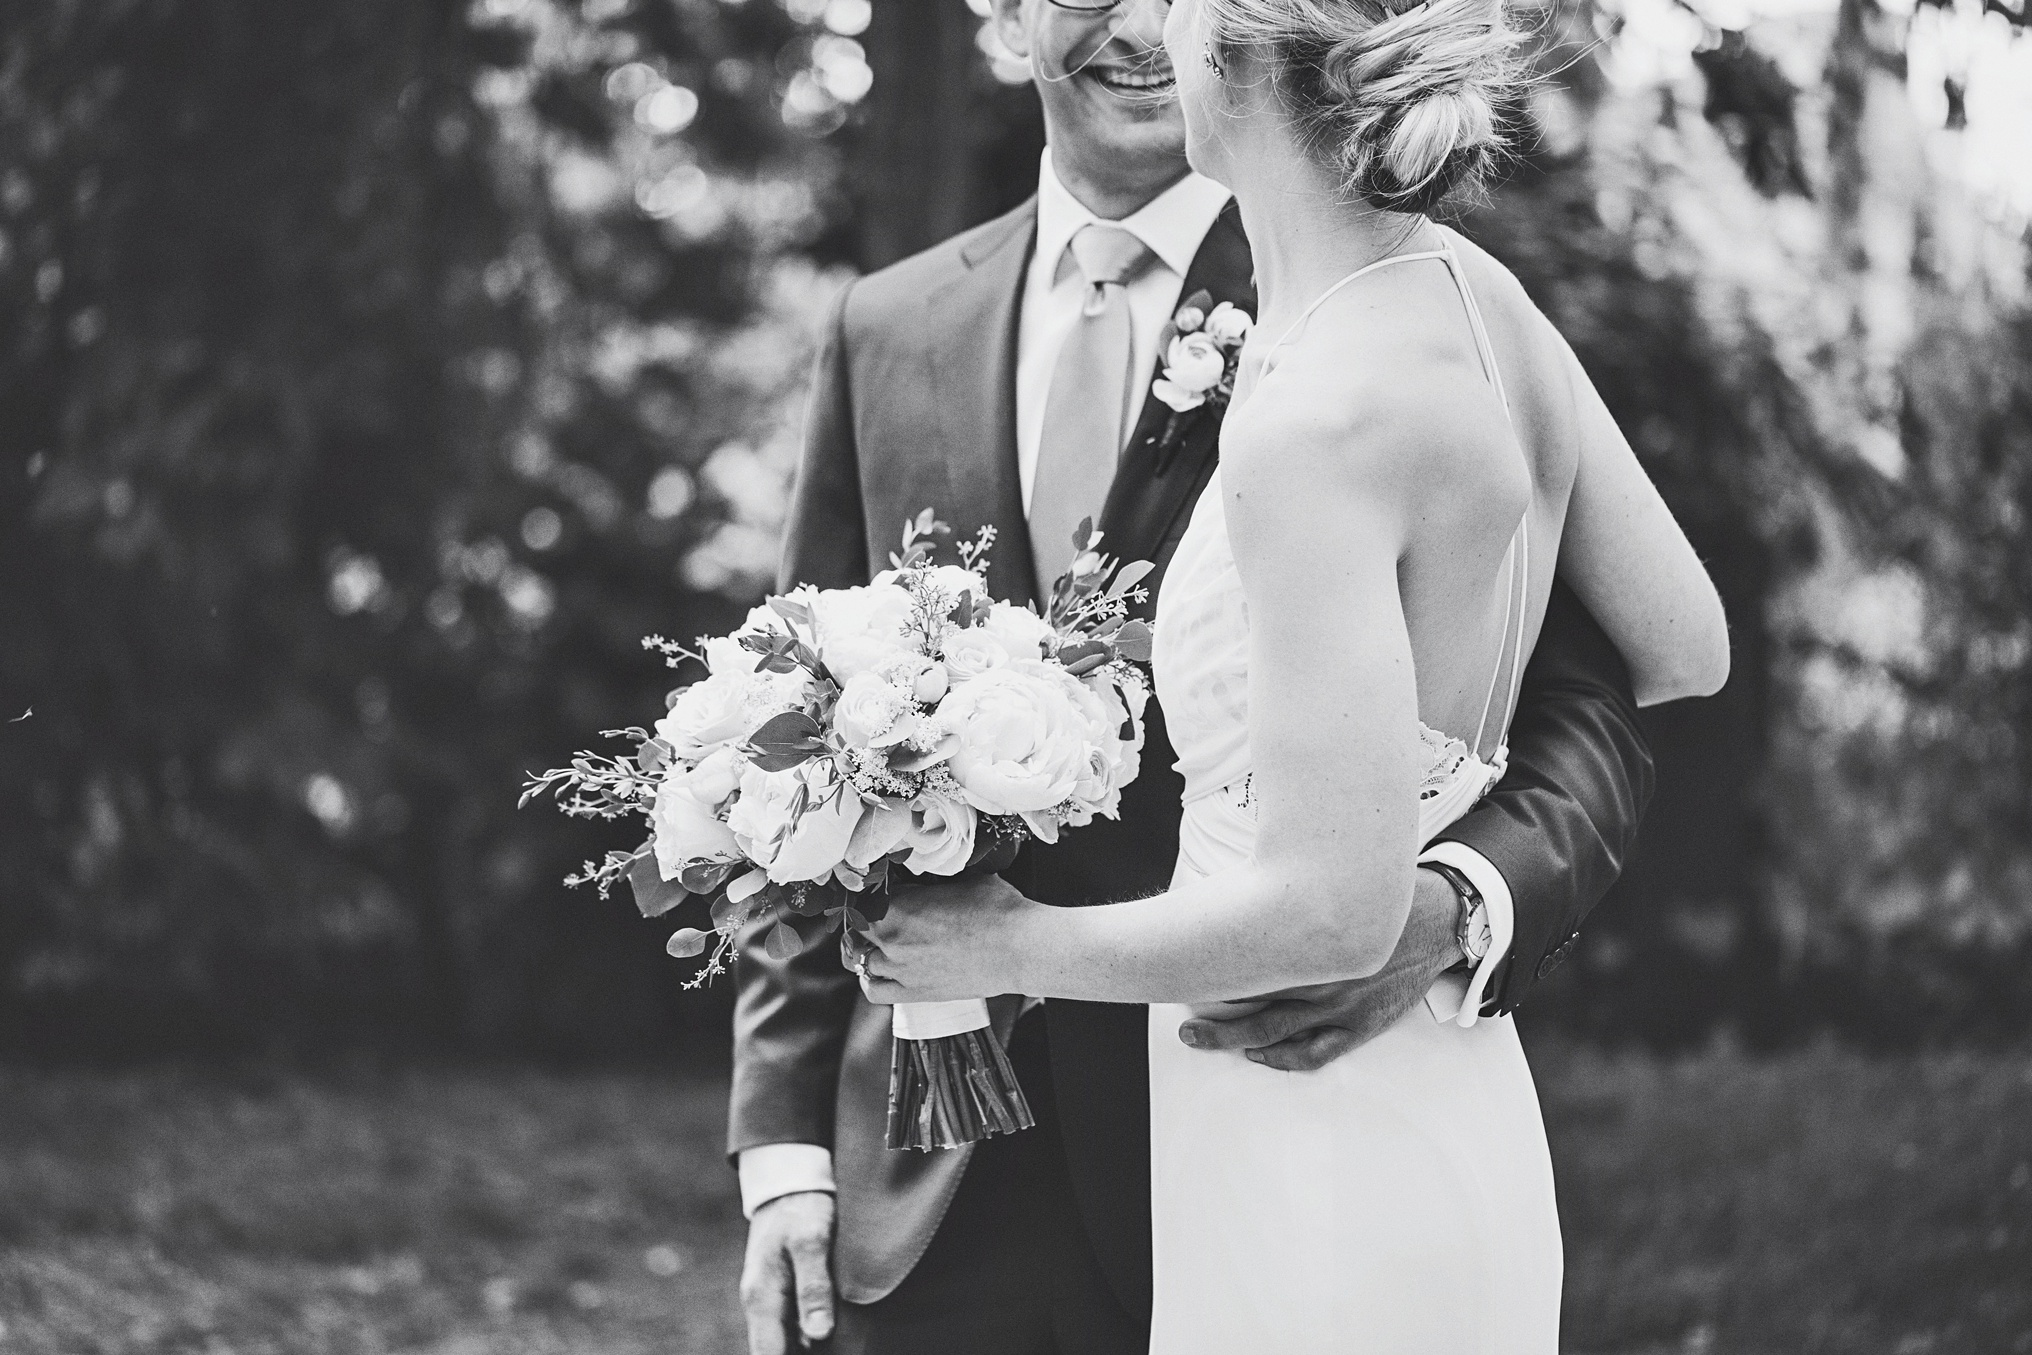 best_wedding_photography_2017_by_lucas_botz_photography_188.jpg